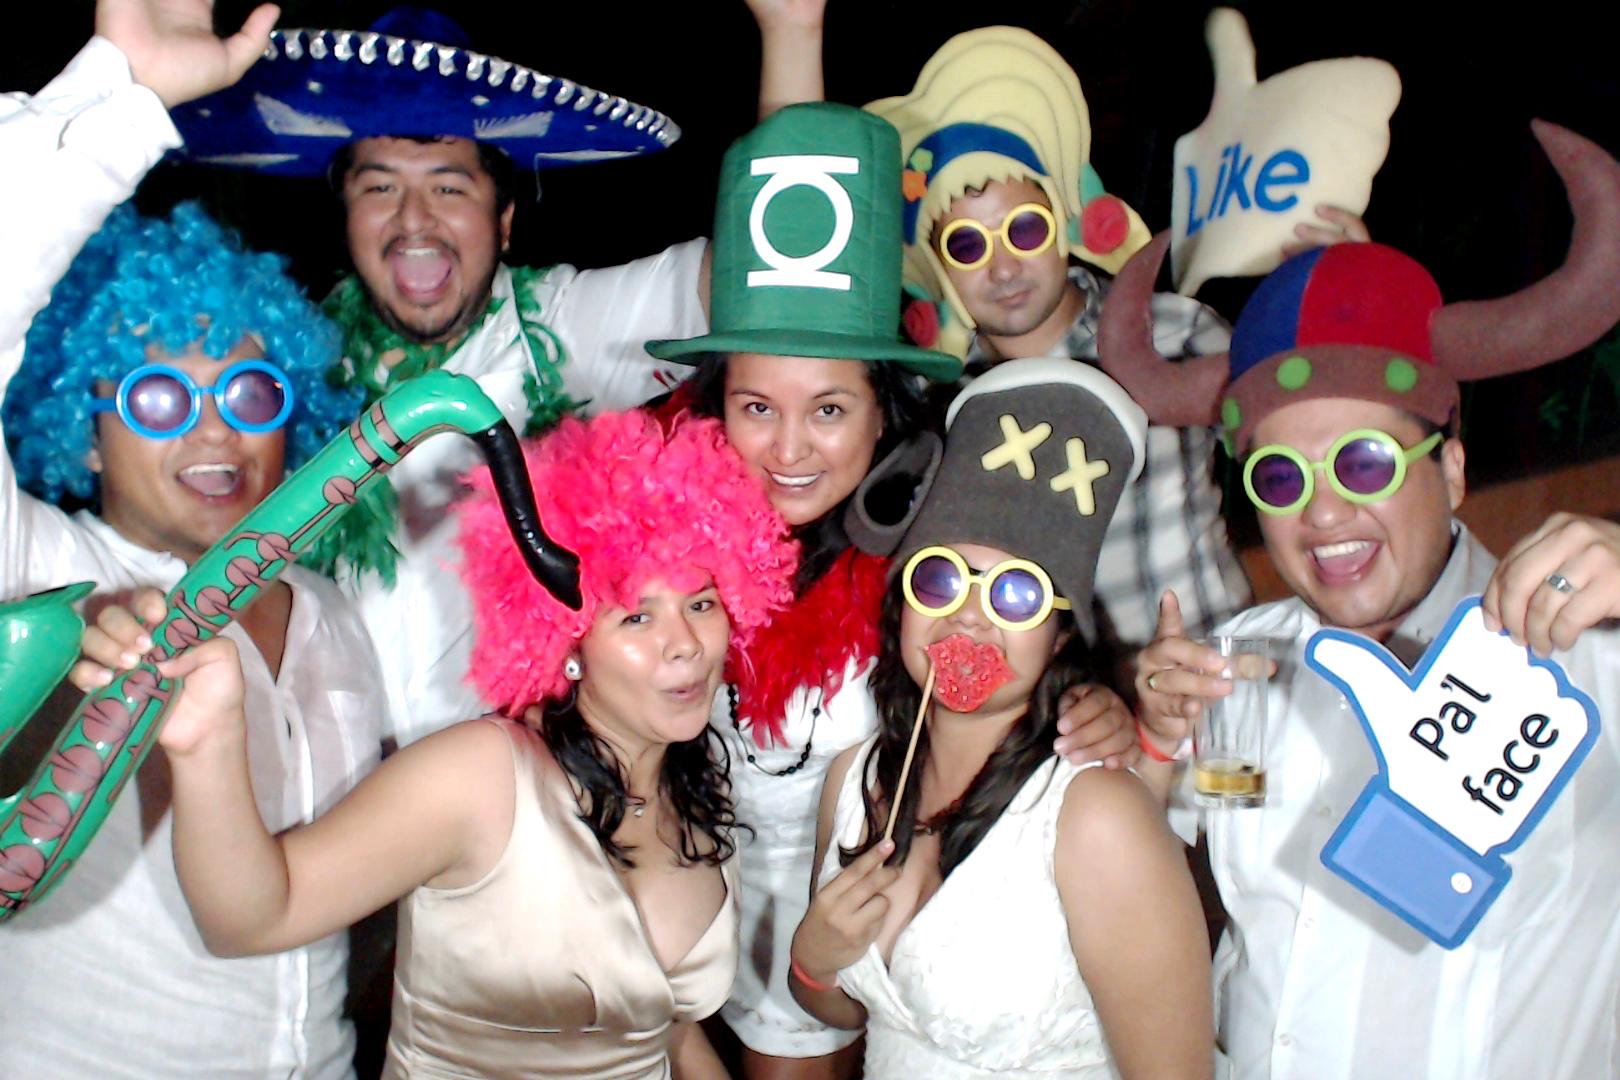 PlayadelCarmenPhotoBoothMexico0062.JPG